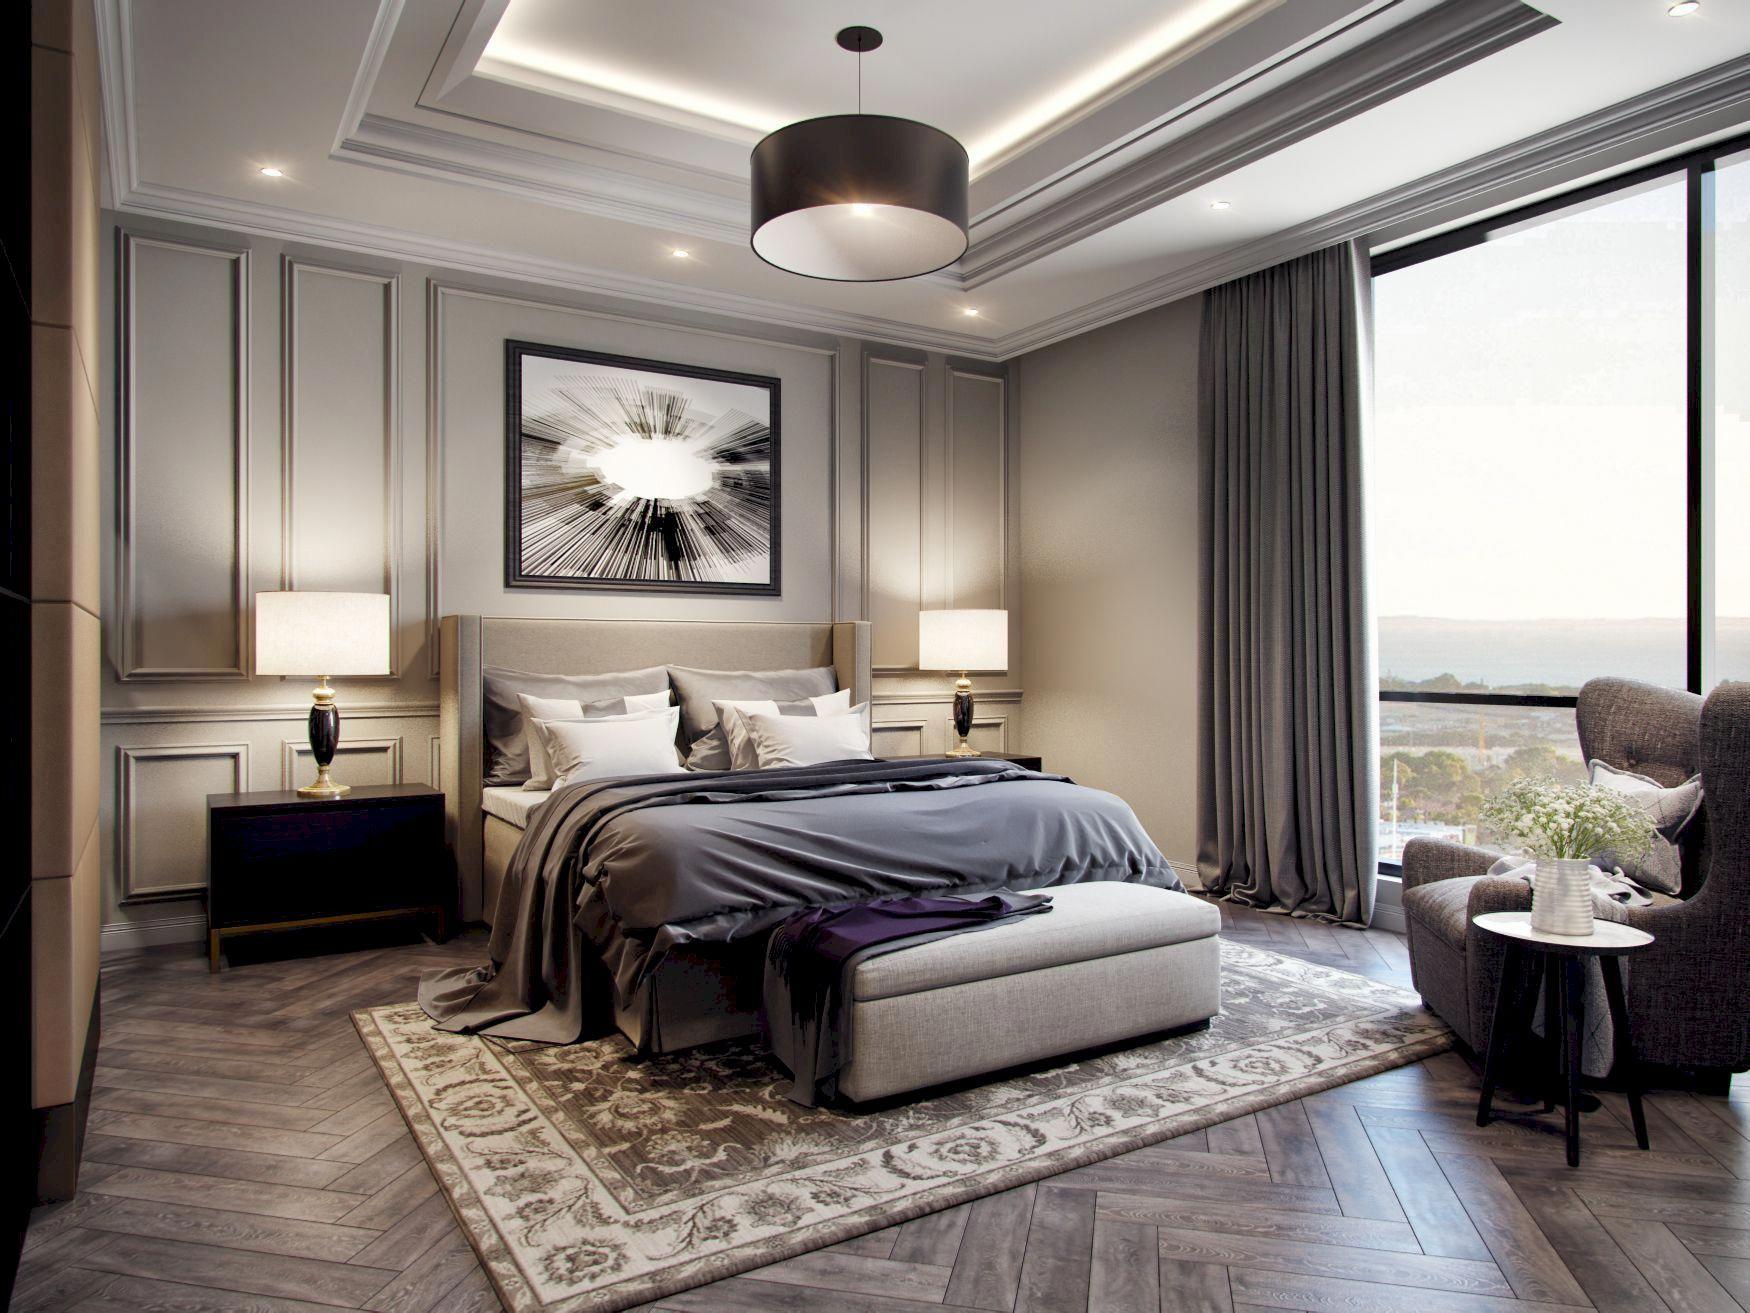 48 impressive classic modern bedroom design ideas luxury on home interior design bedroom id=57507